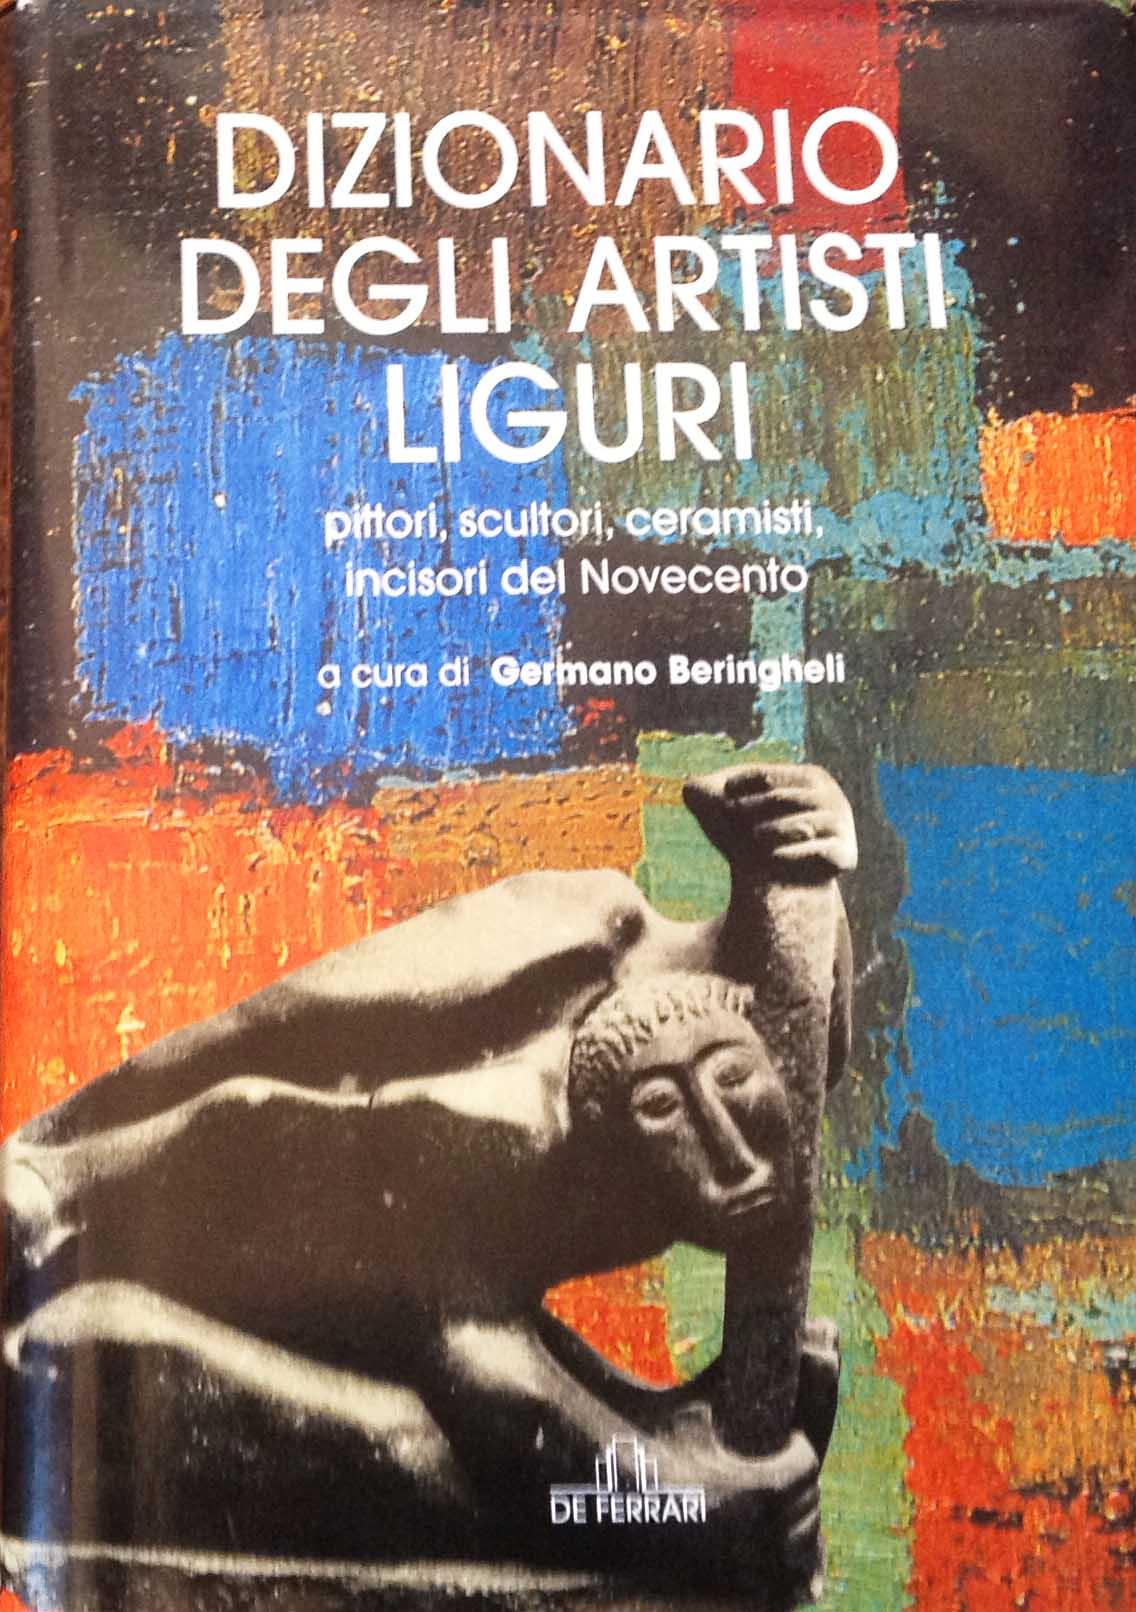 DIZIONARIO DEGLI ARTISTI LIGURI